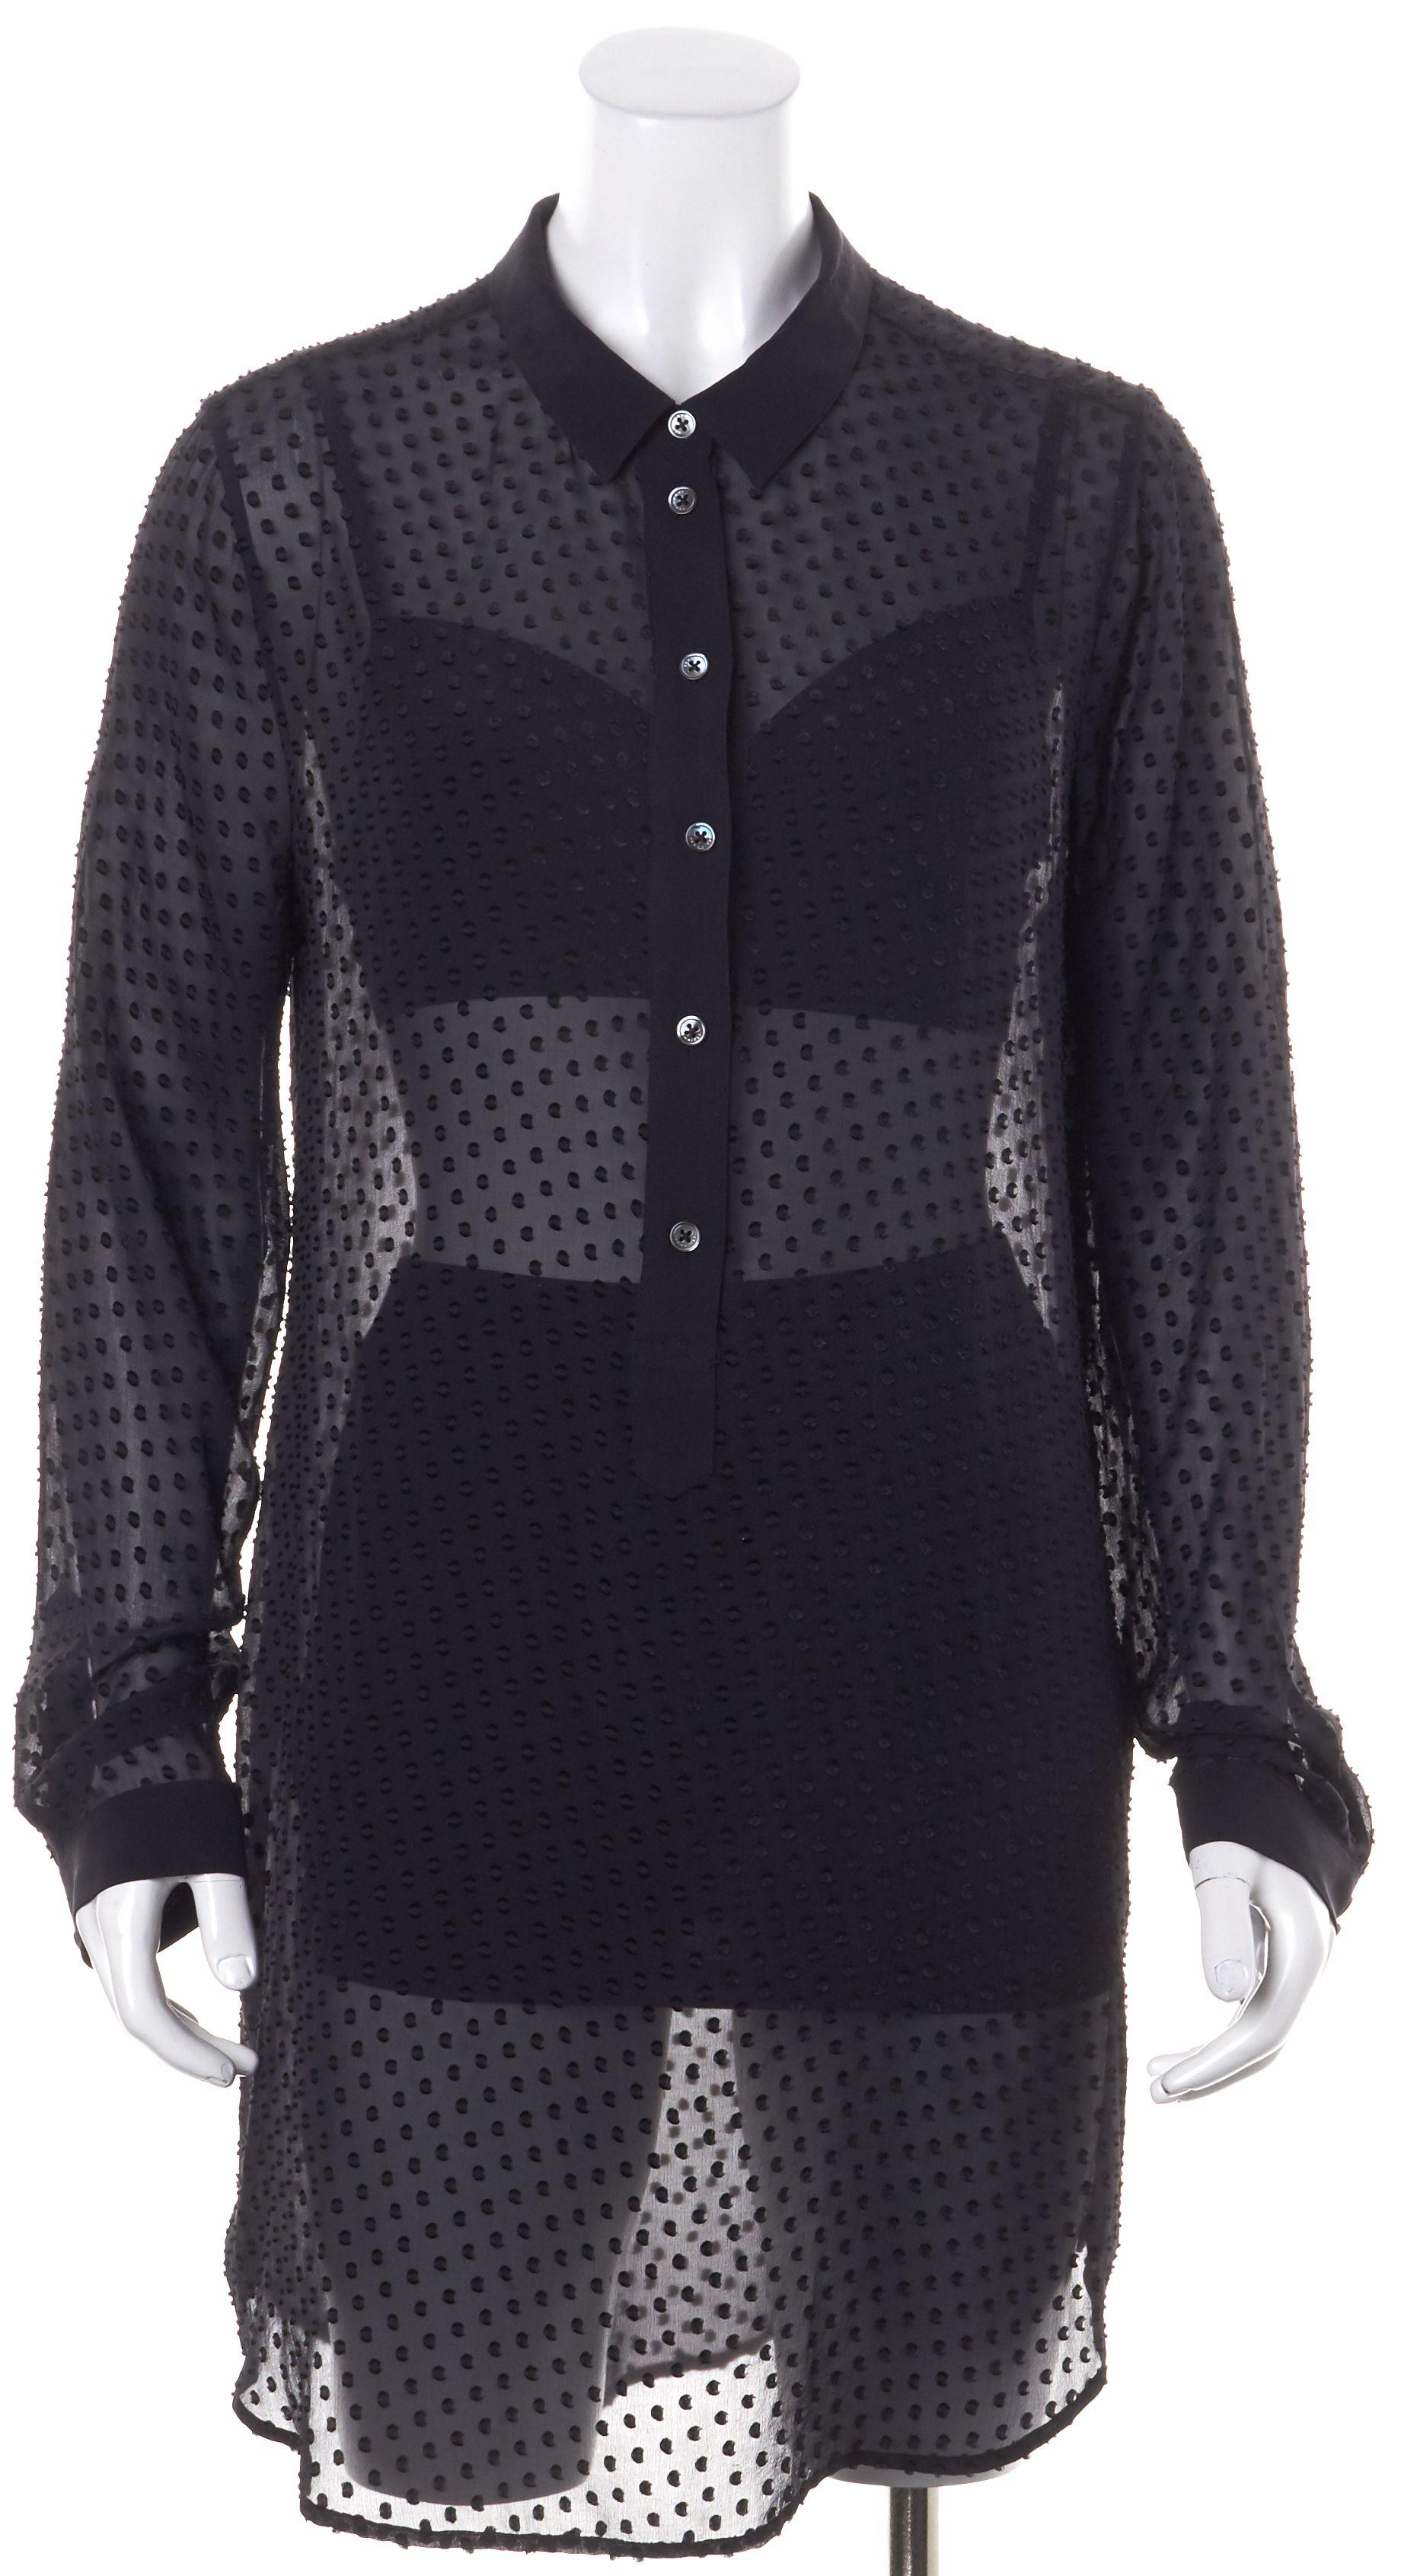 Equipment Black Sheer Swiss Dot Embroidered Mini Shirt Dress ...